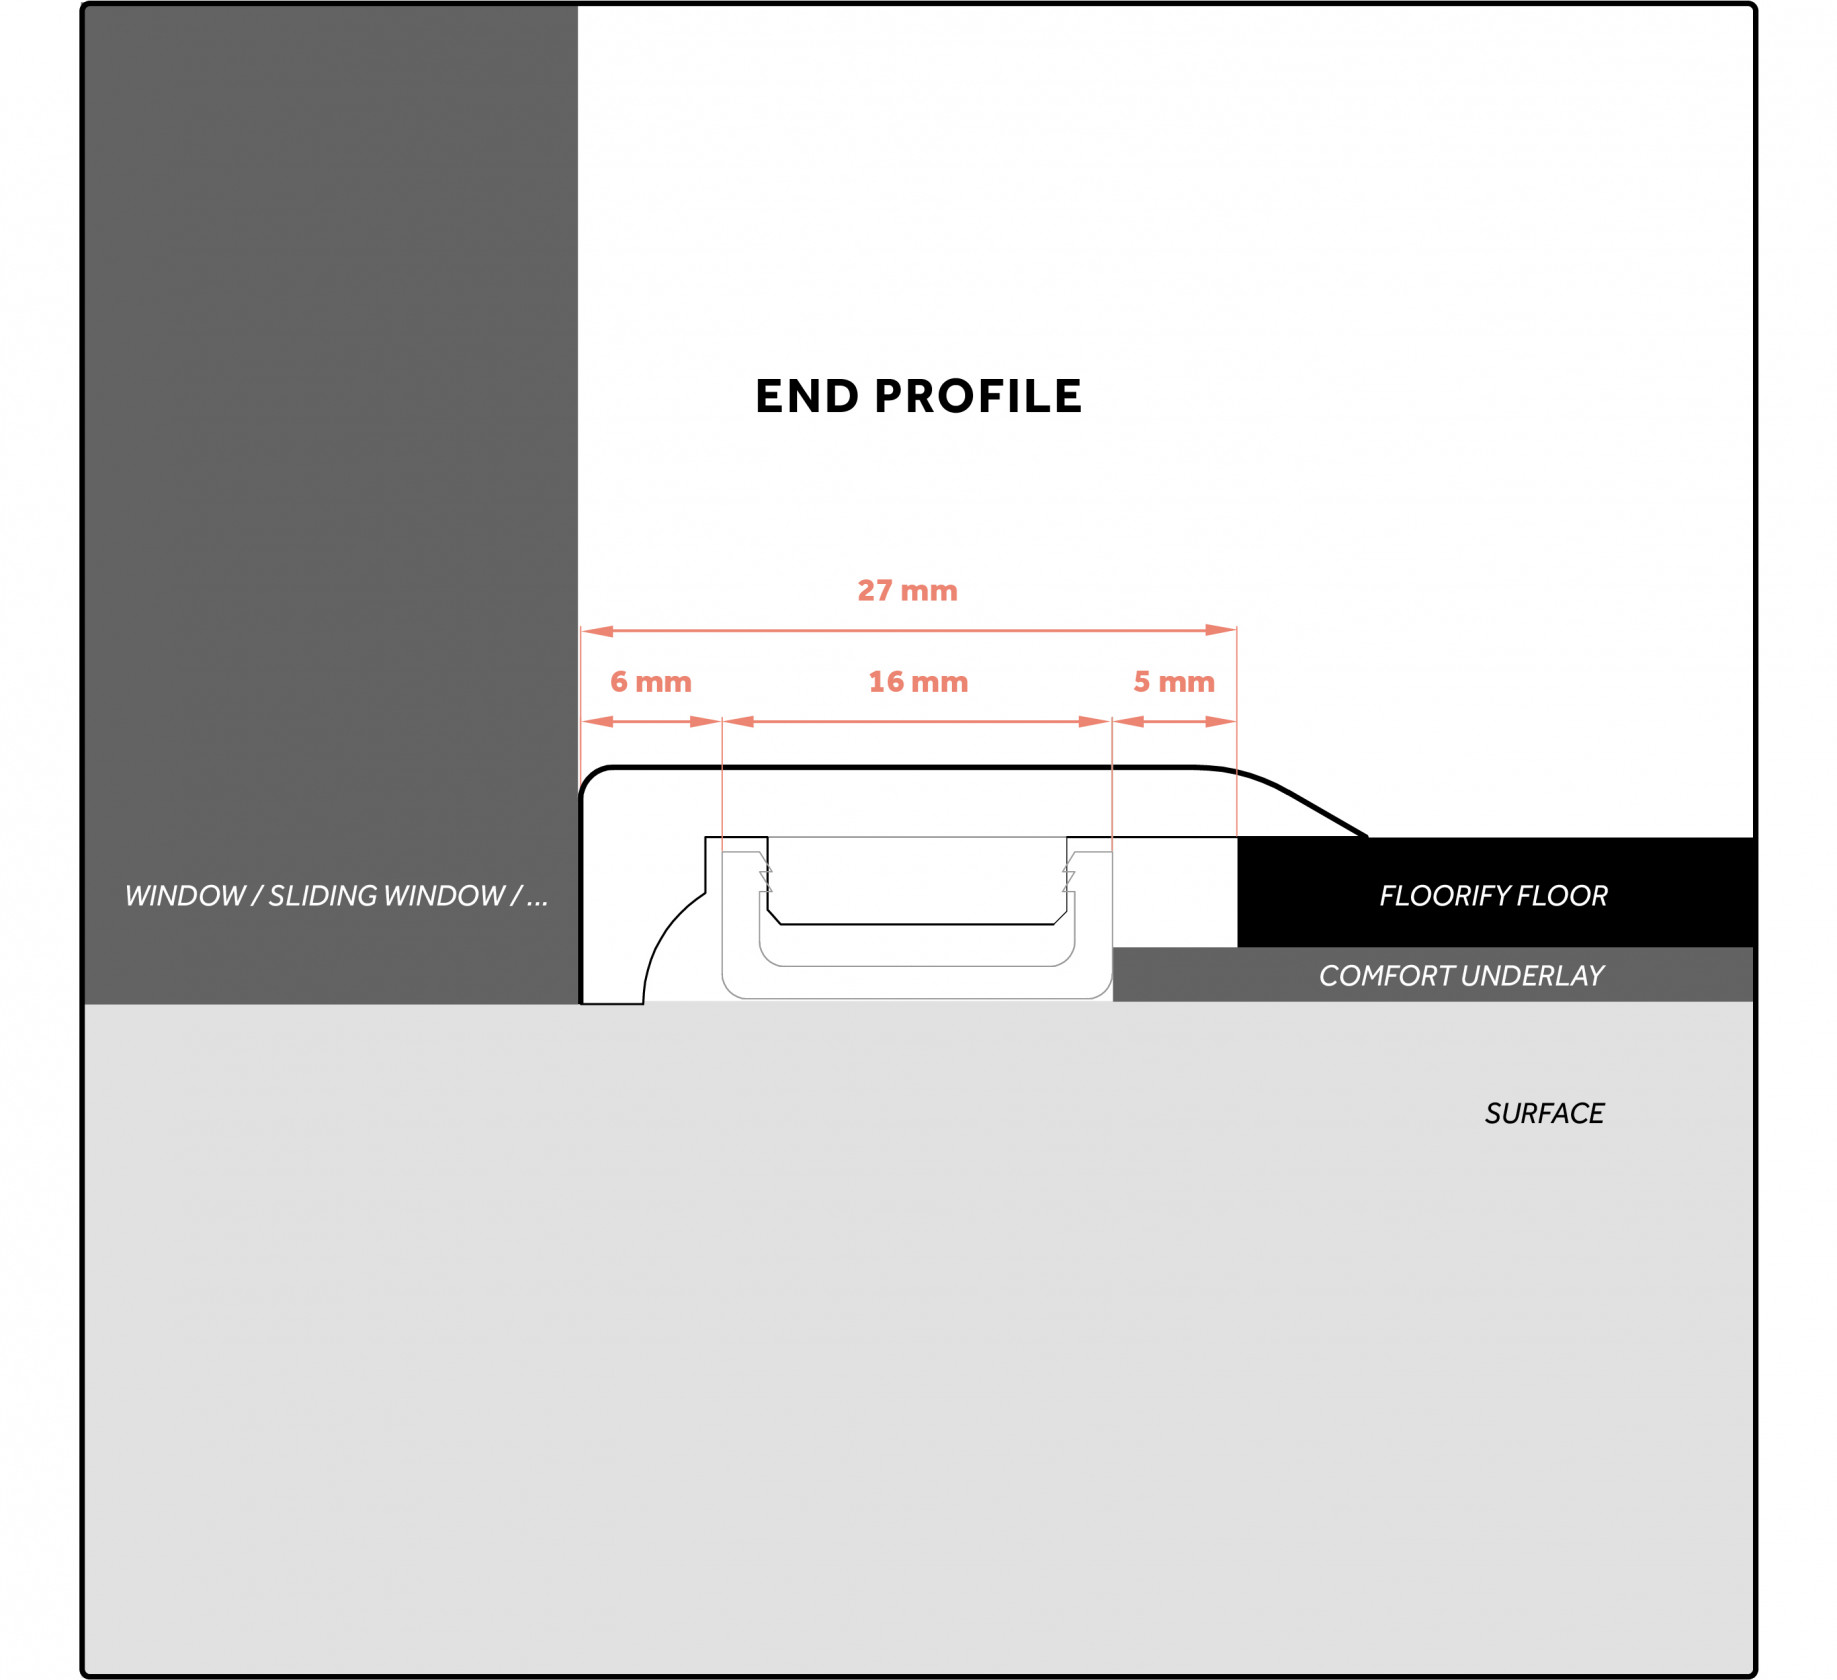 Floorify - End profile.jpg